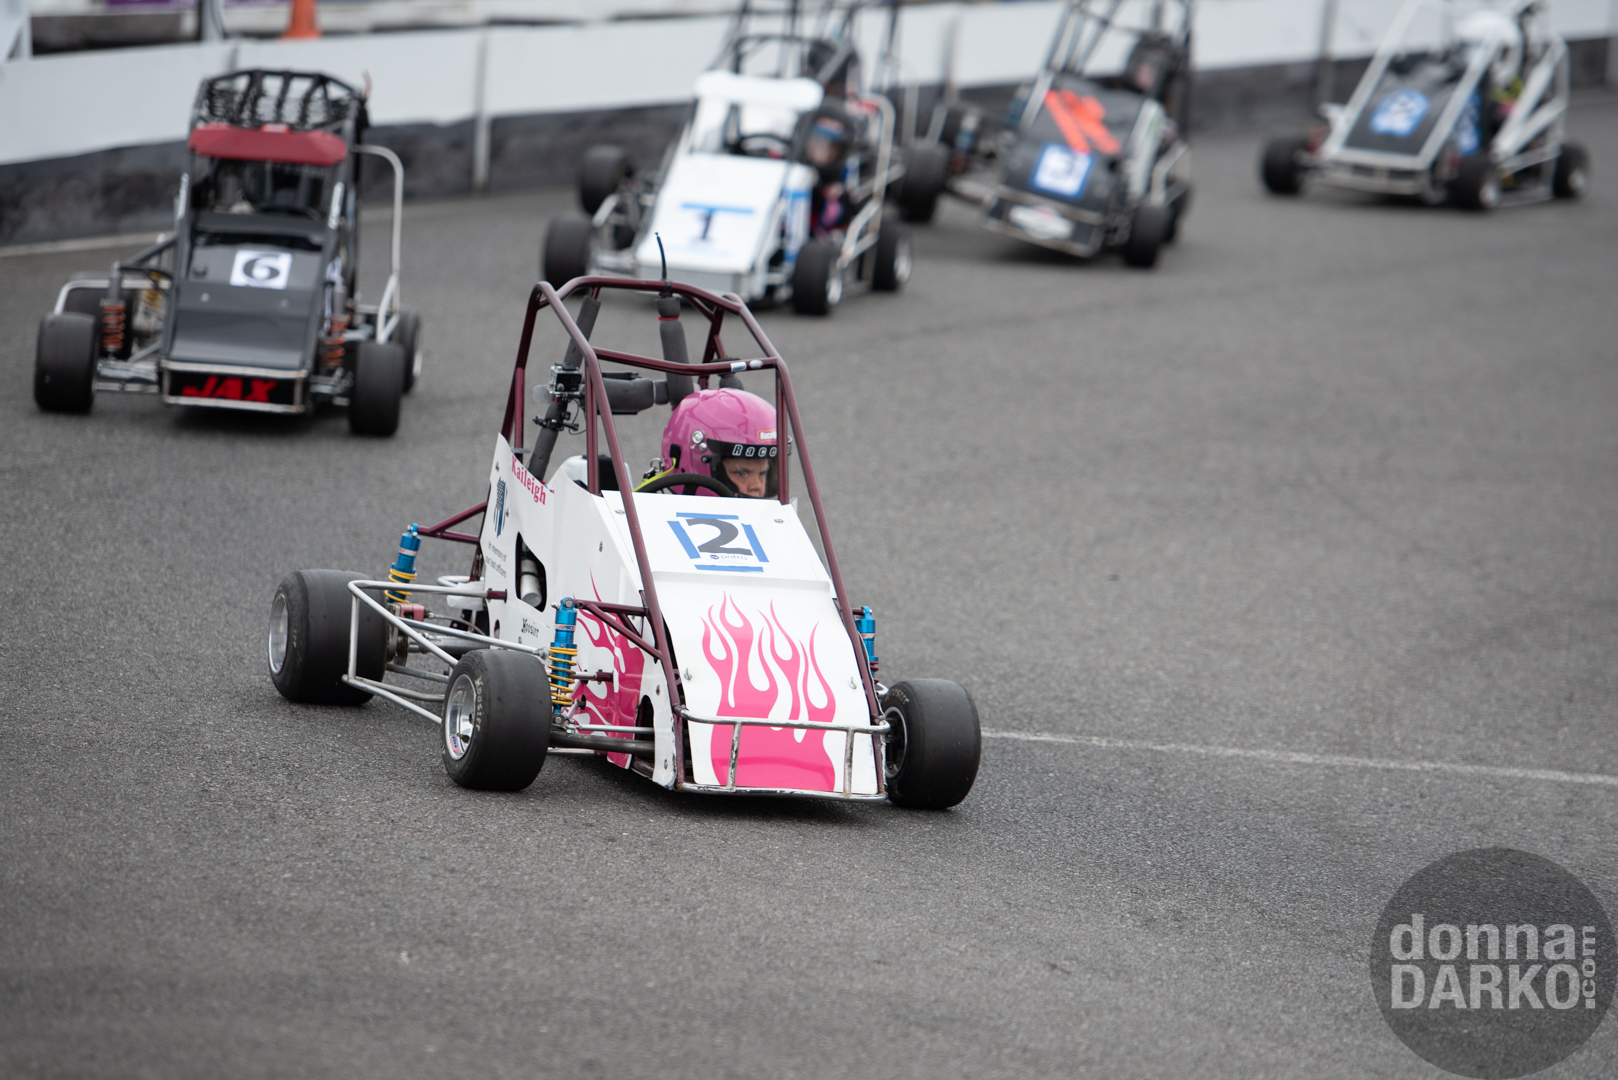 QWMA (Racing) 8-11-2019 DSC_6157.jpg